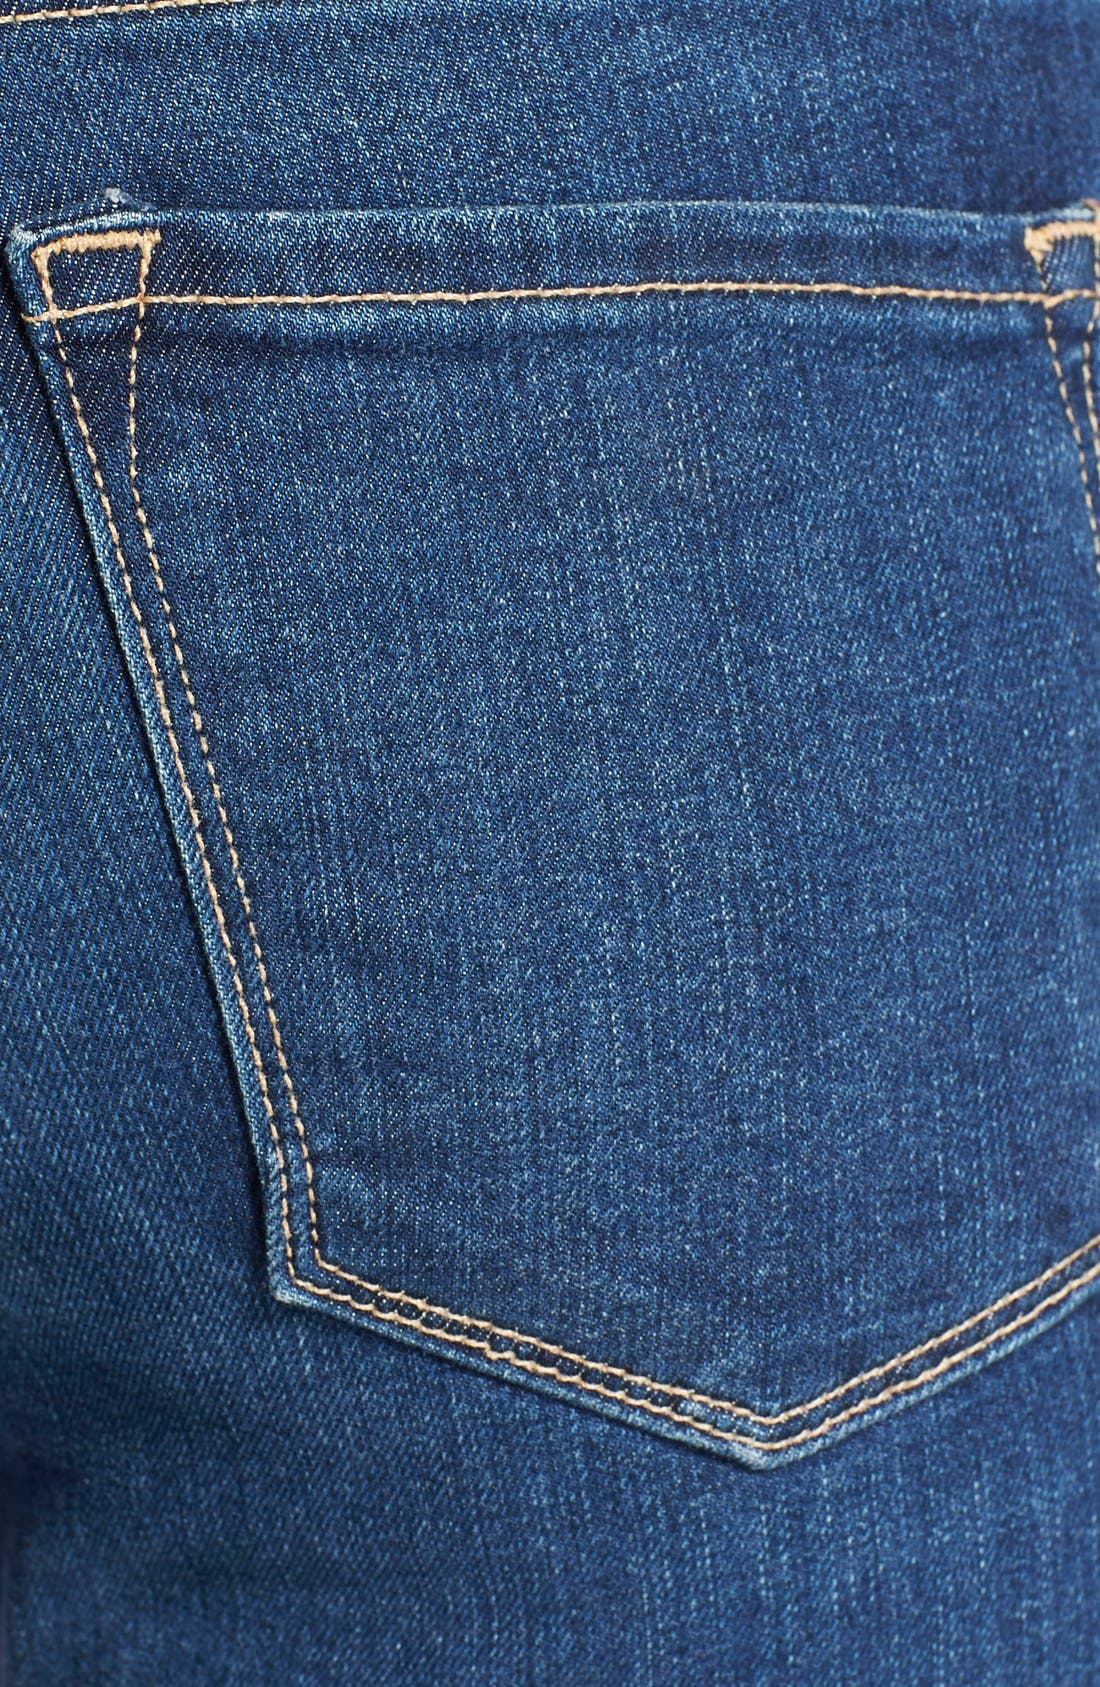 Alternate Image 3  - Frame Denim 'Le Skinny de Jeanne' Jeans (Columbia Road)